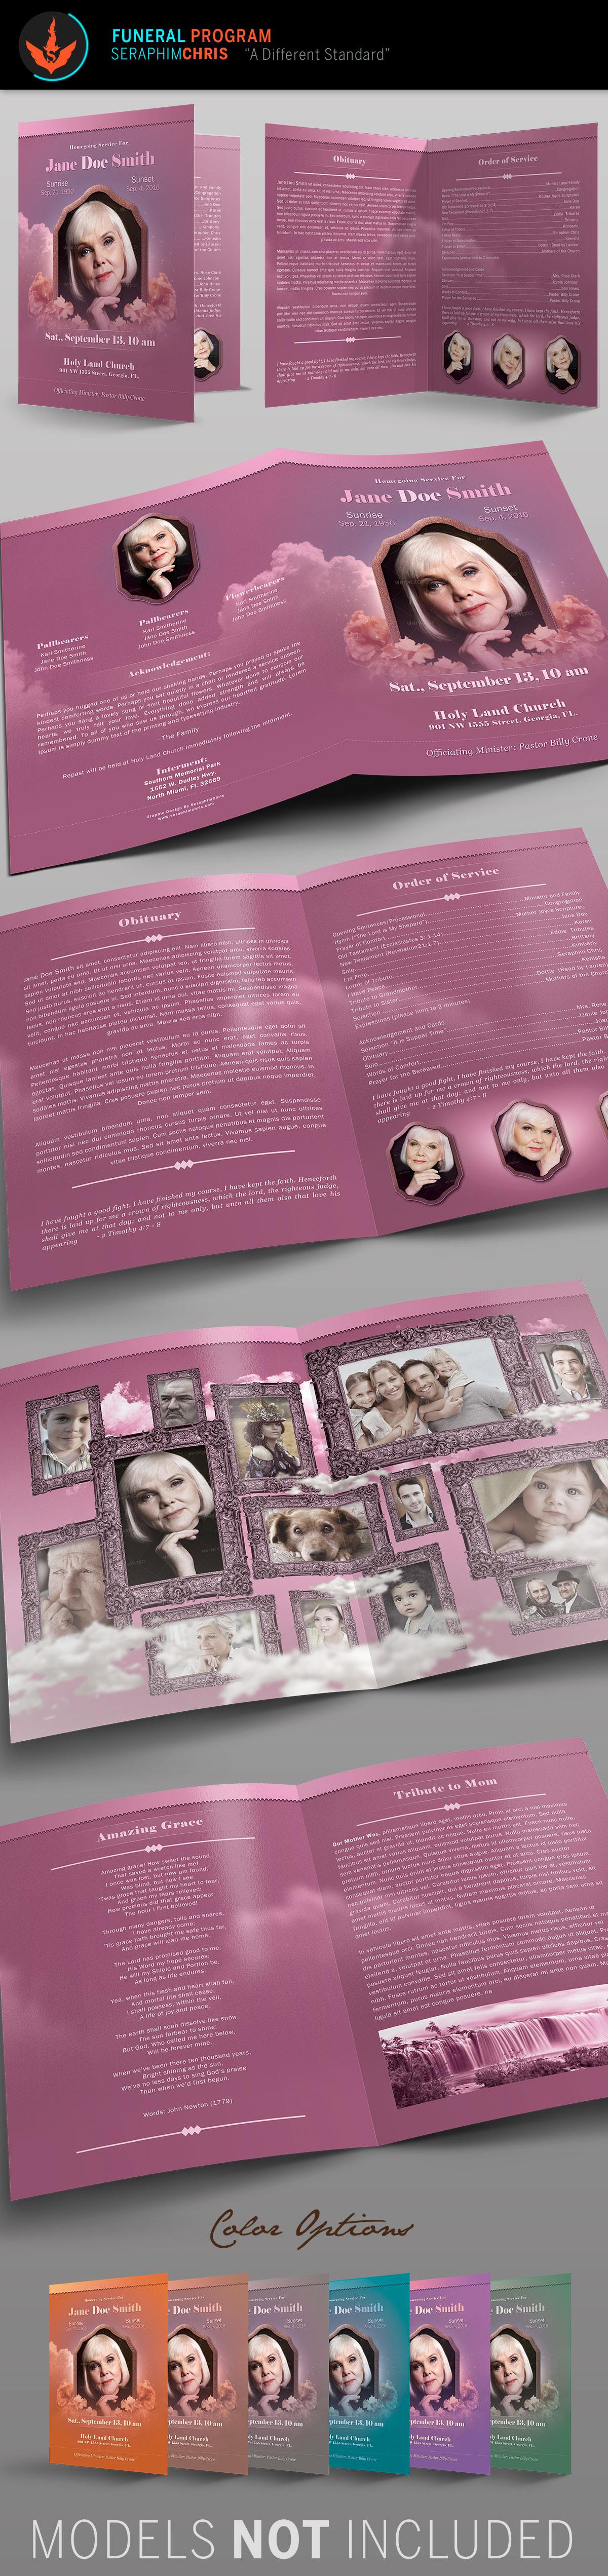 funeral program vintage Memorial Booklet contemporary bulletin pink Bi-fold obituary photoshop template